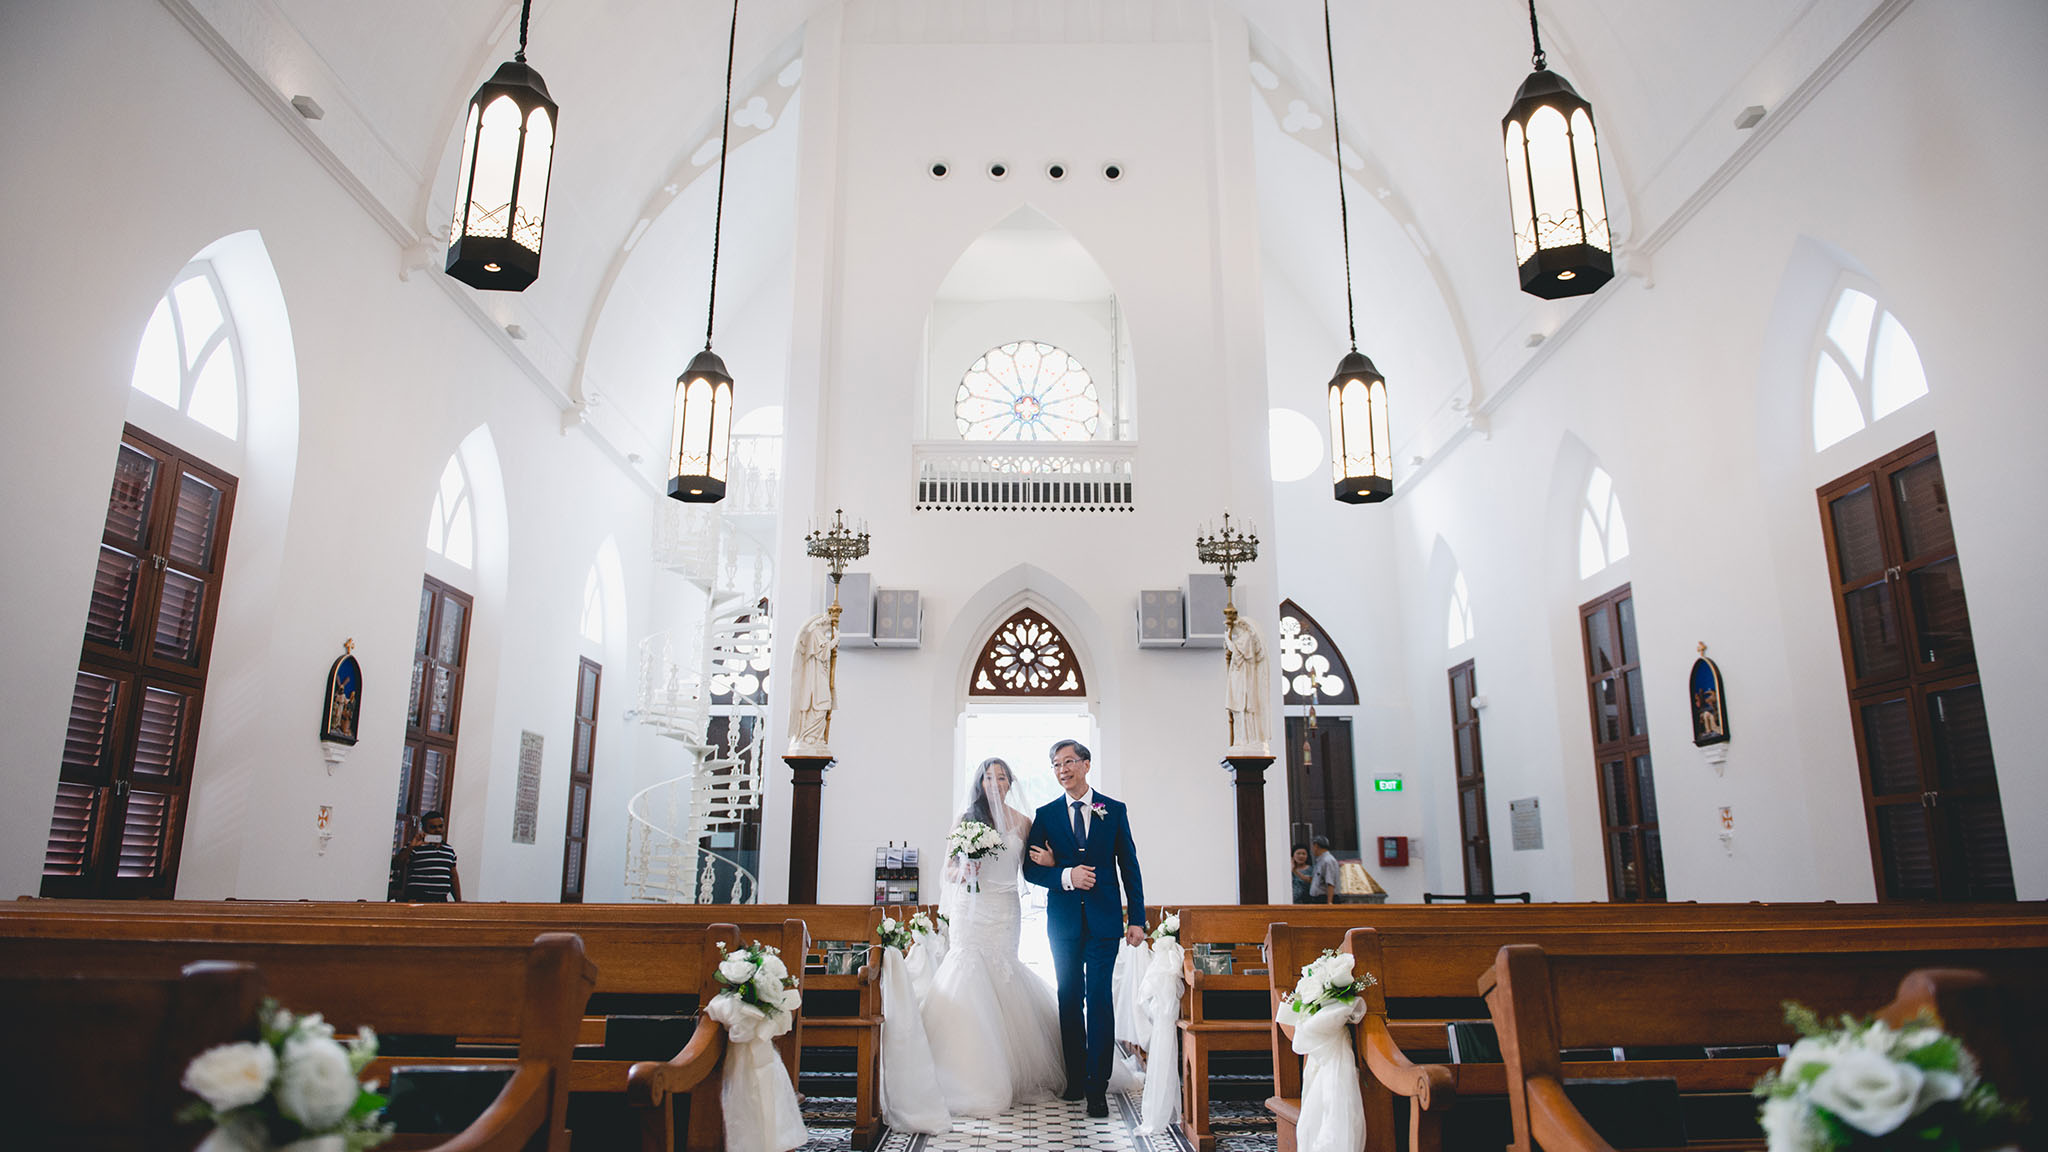 wedding church saints peter and paul 00020.JPG